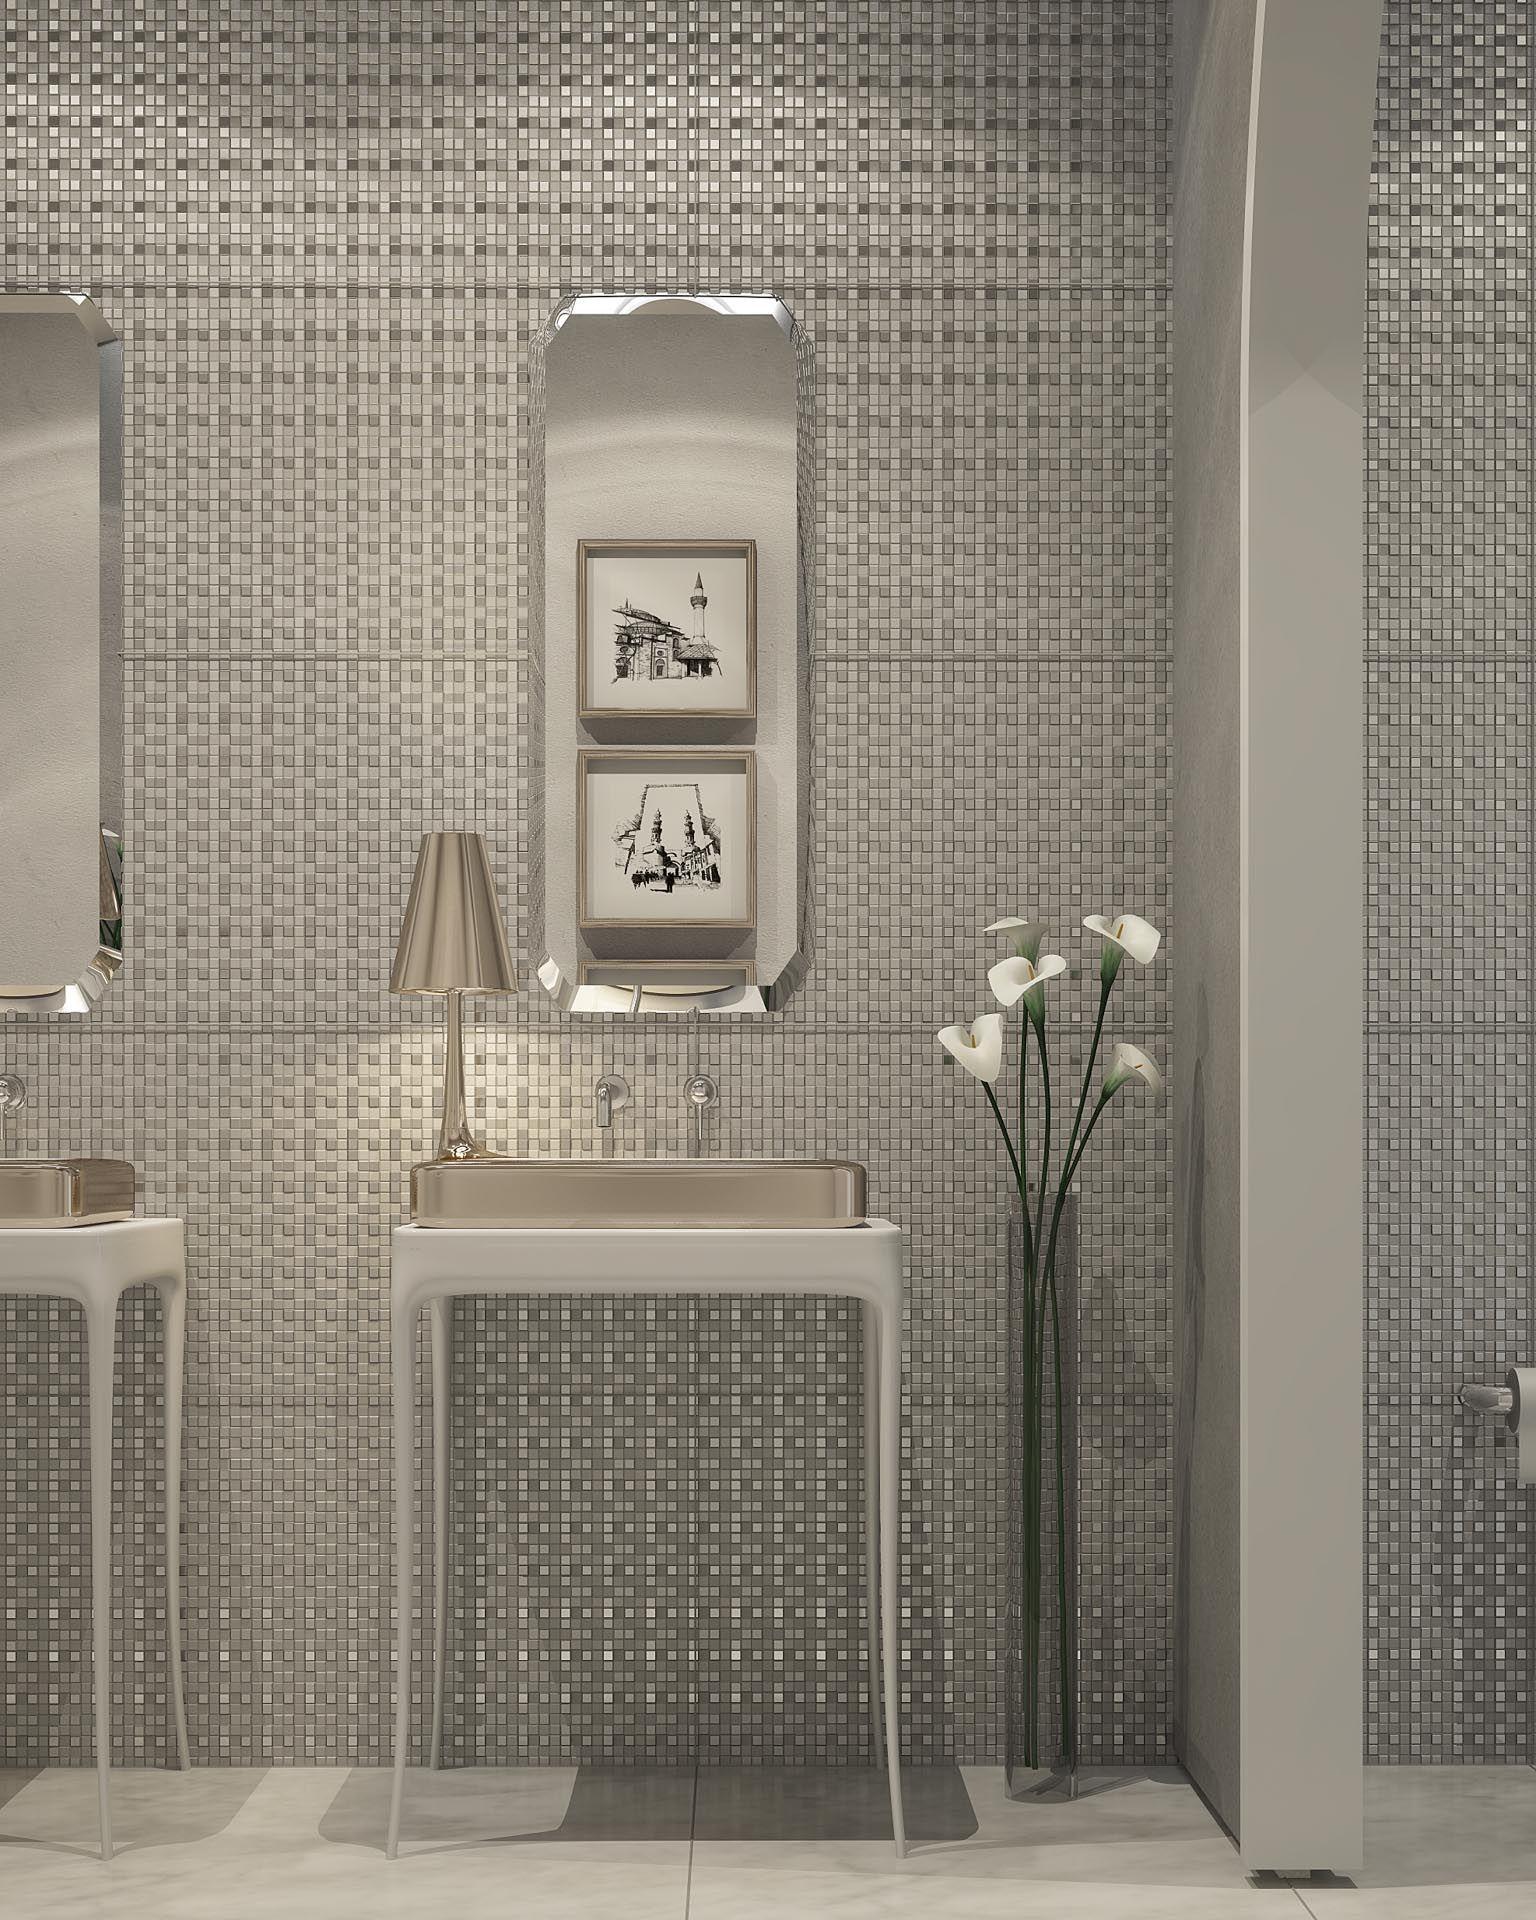 mimar interiors << stunning  deserves better than fake flowers